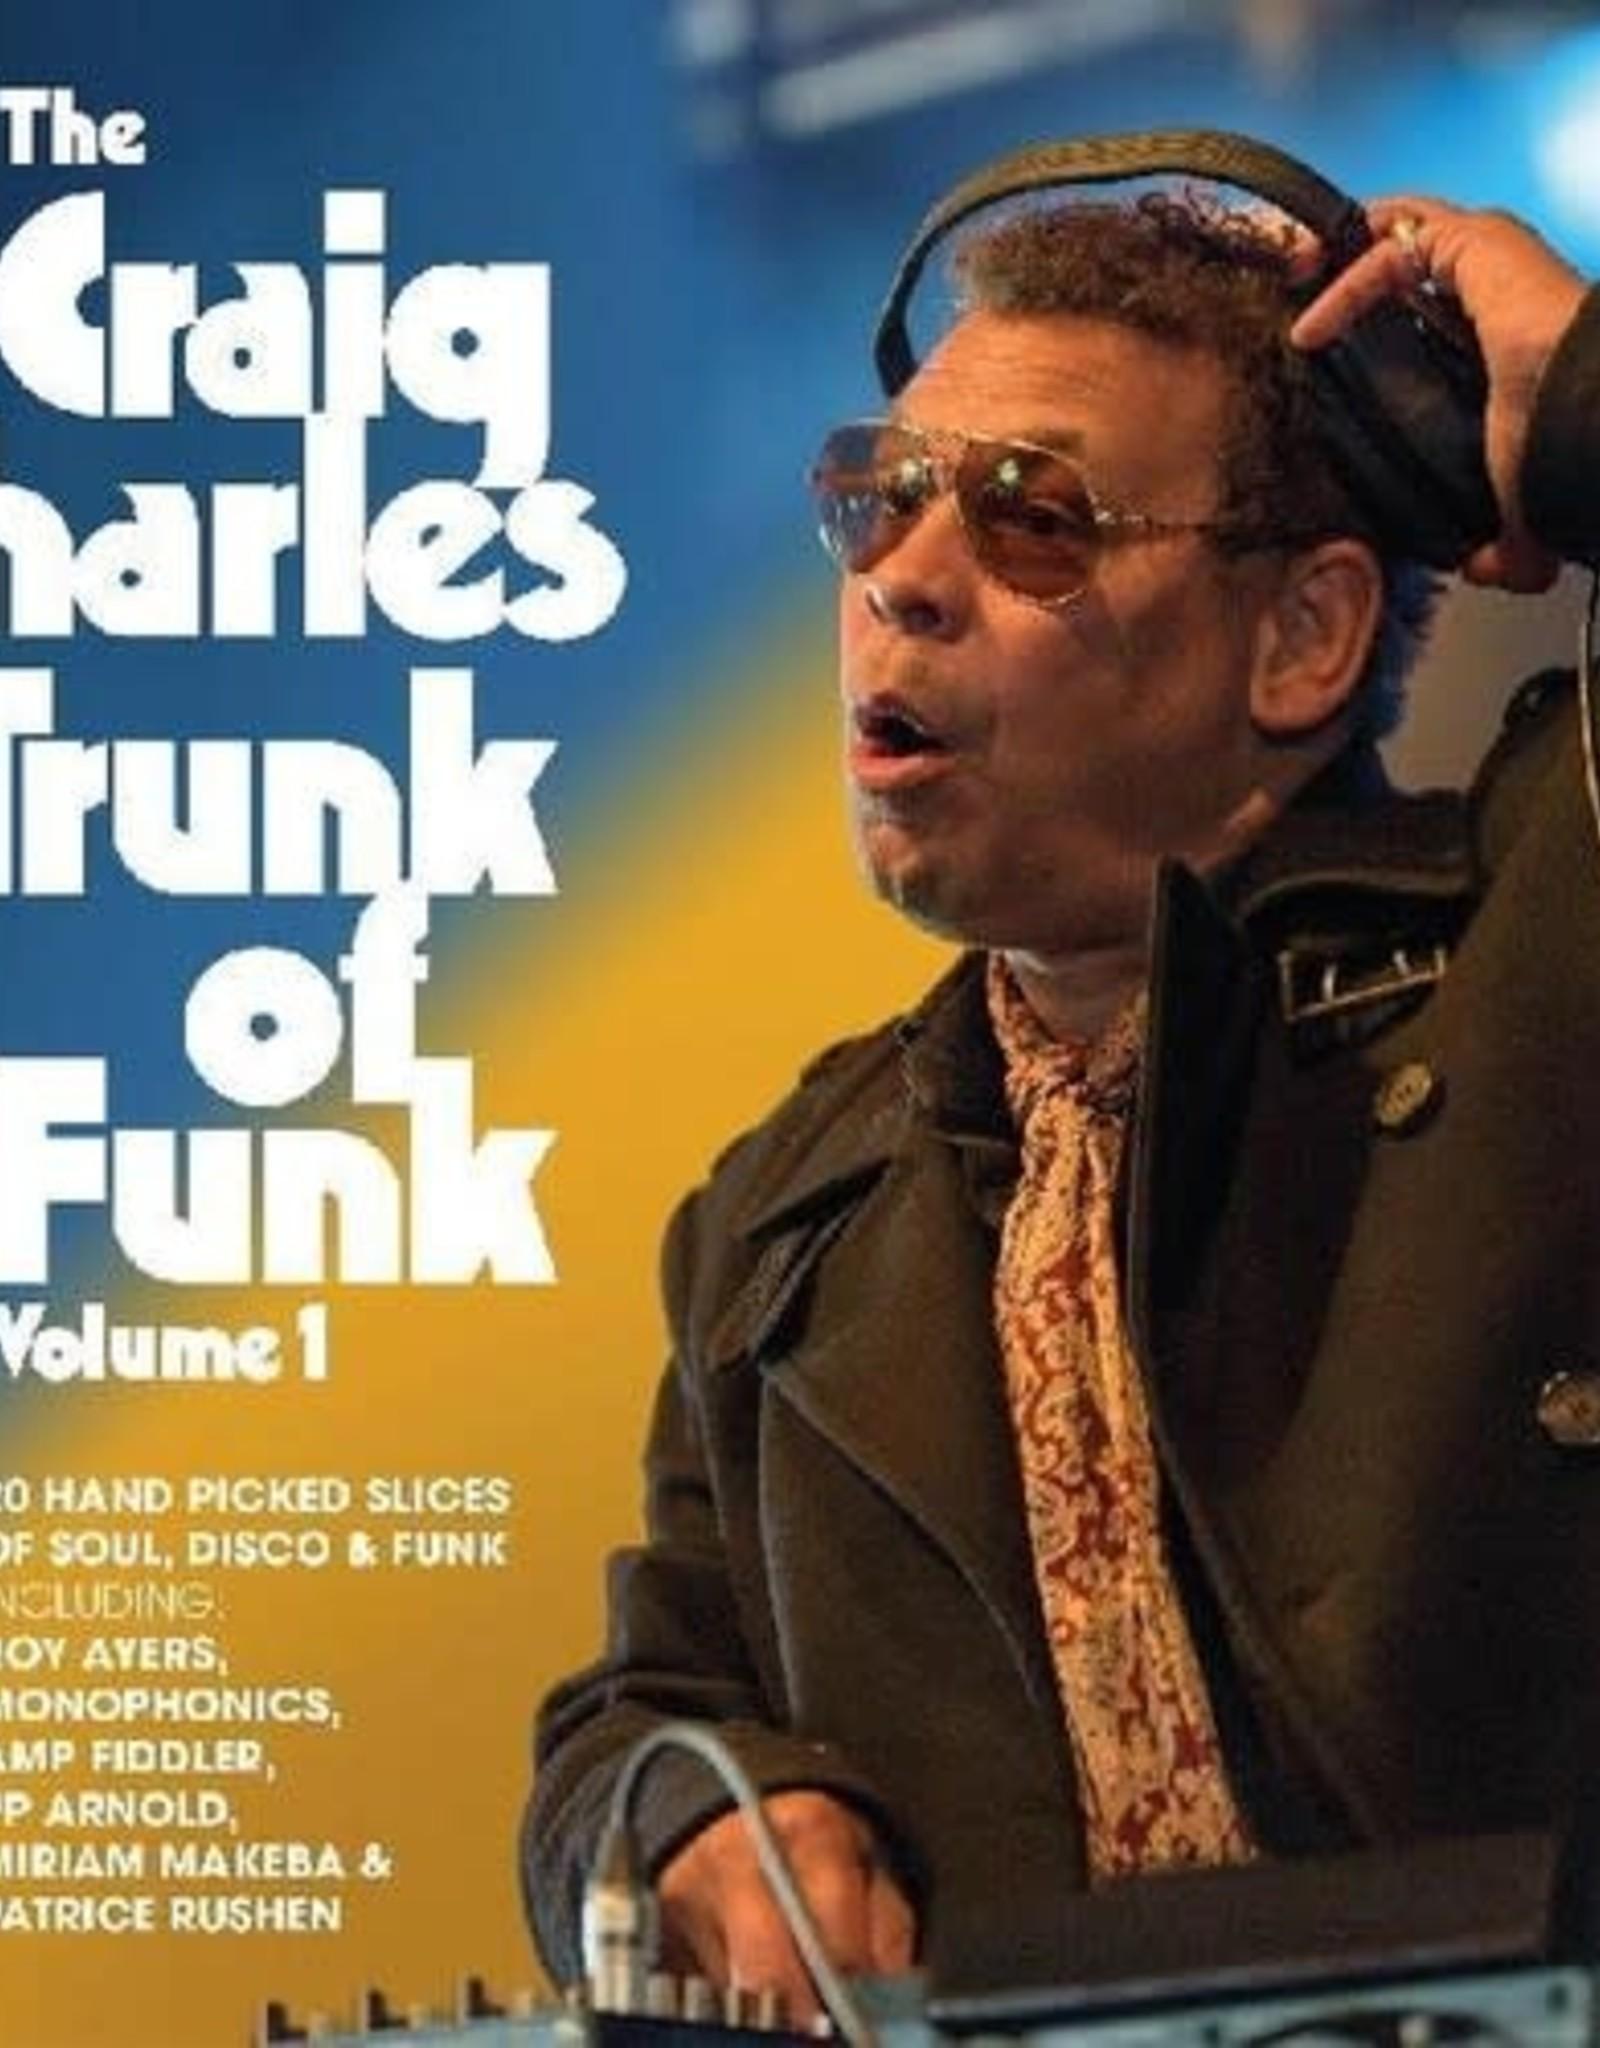 The Craig Charles Trunk Of Funk Vol 1